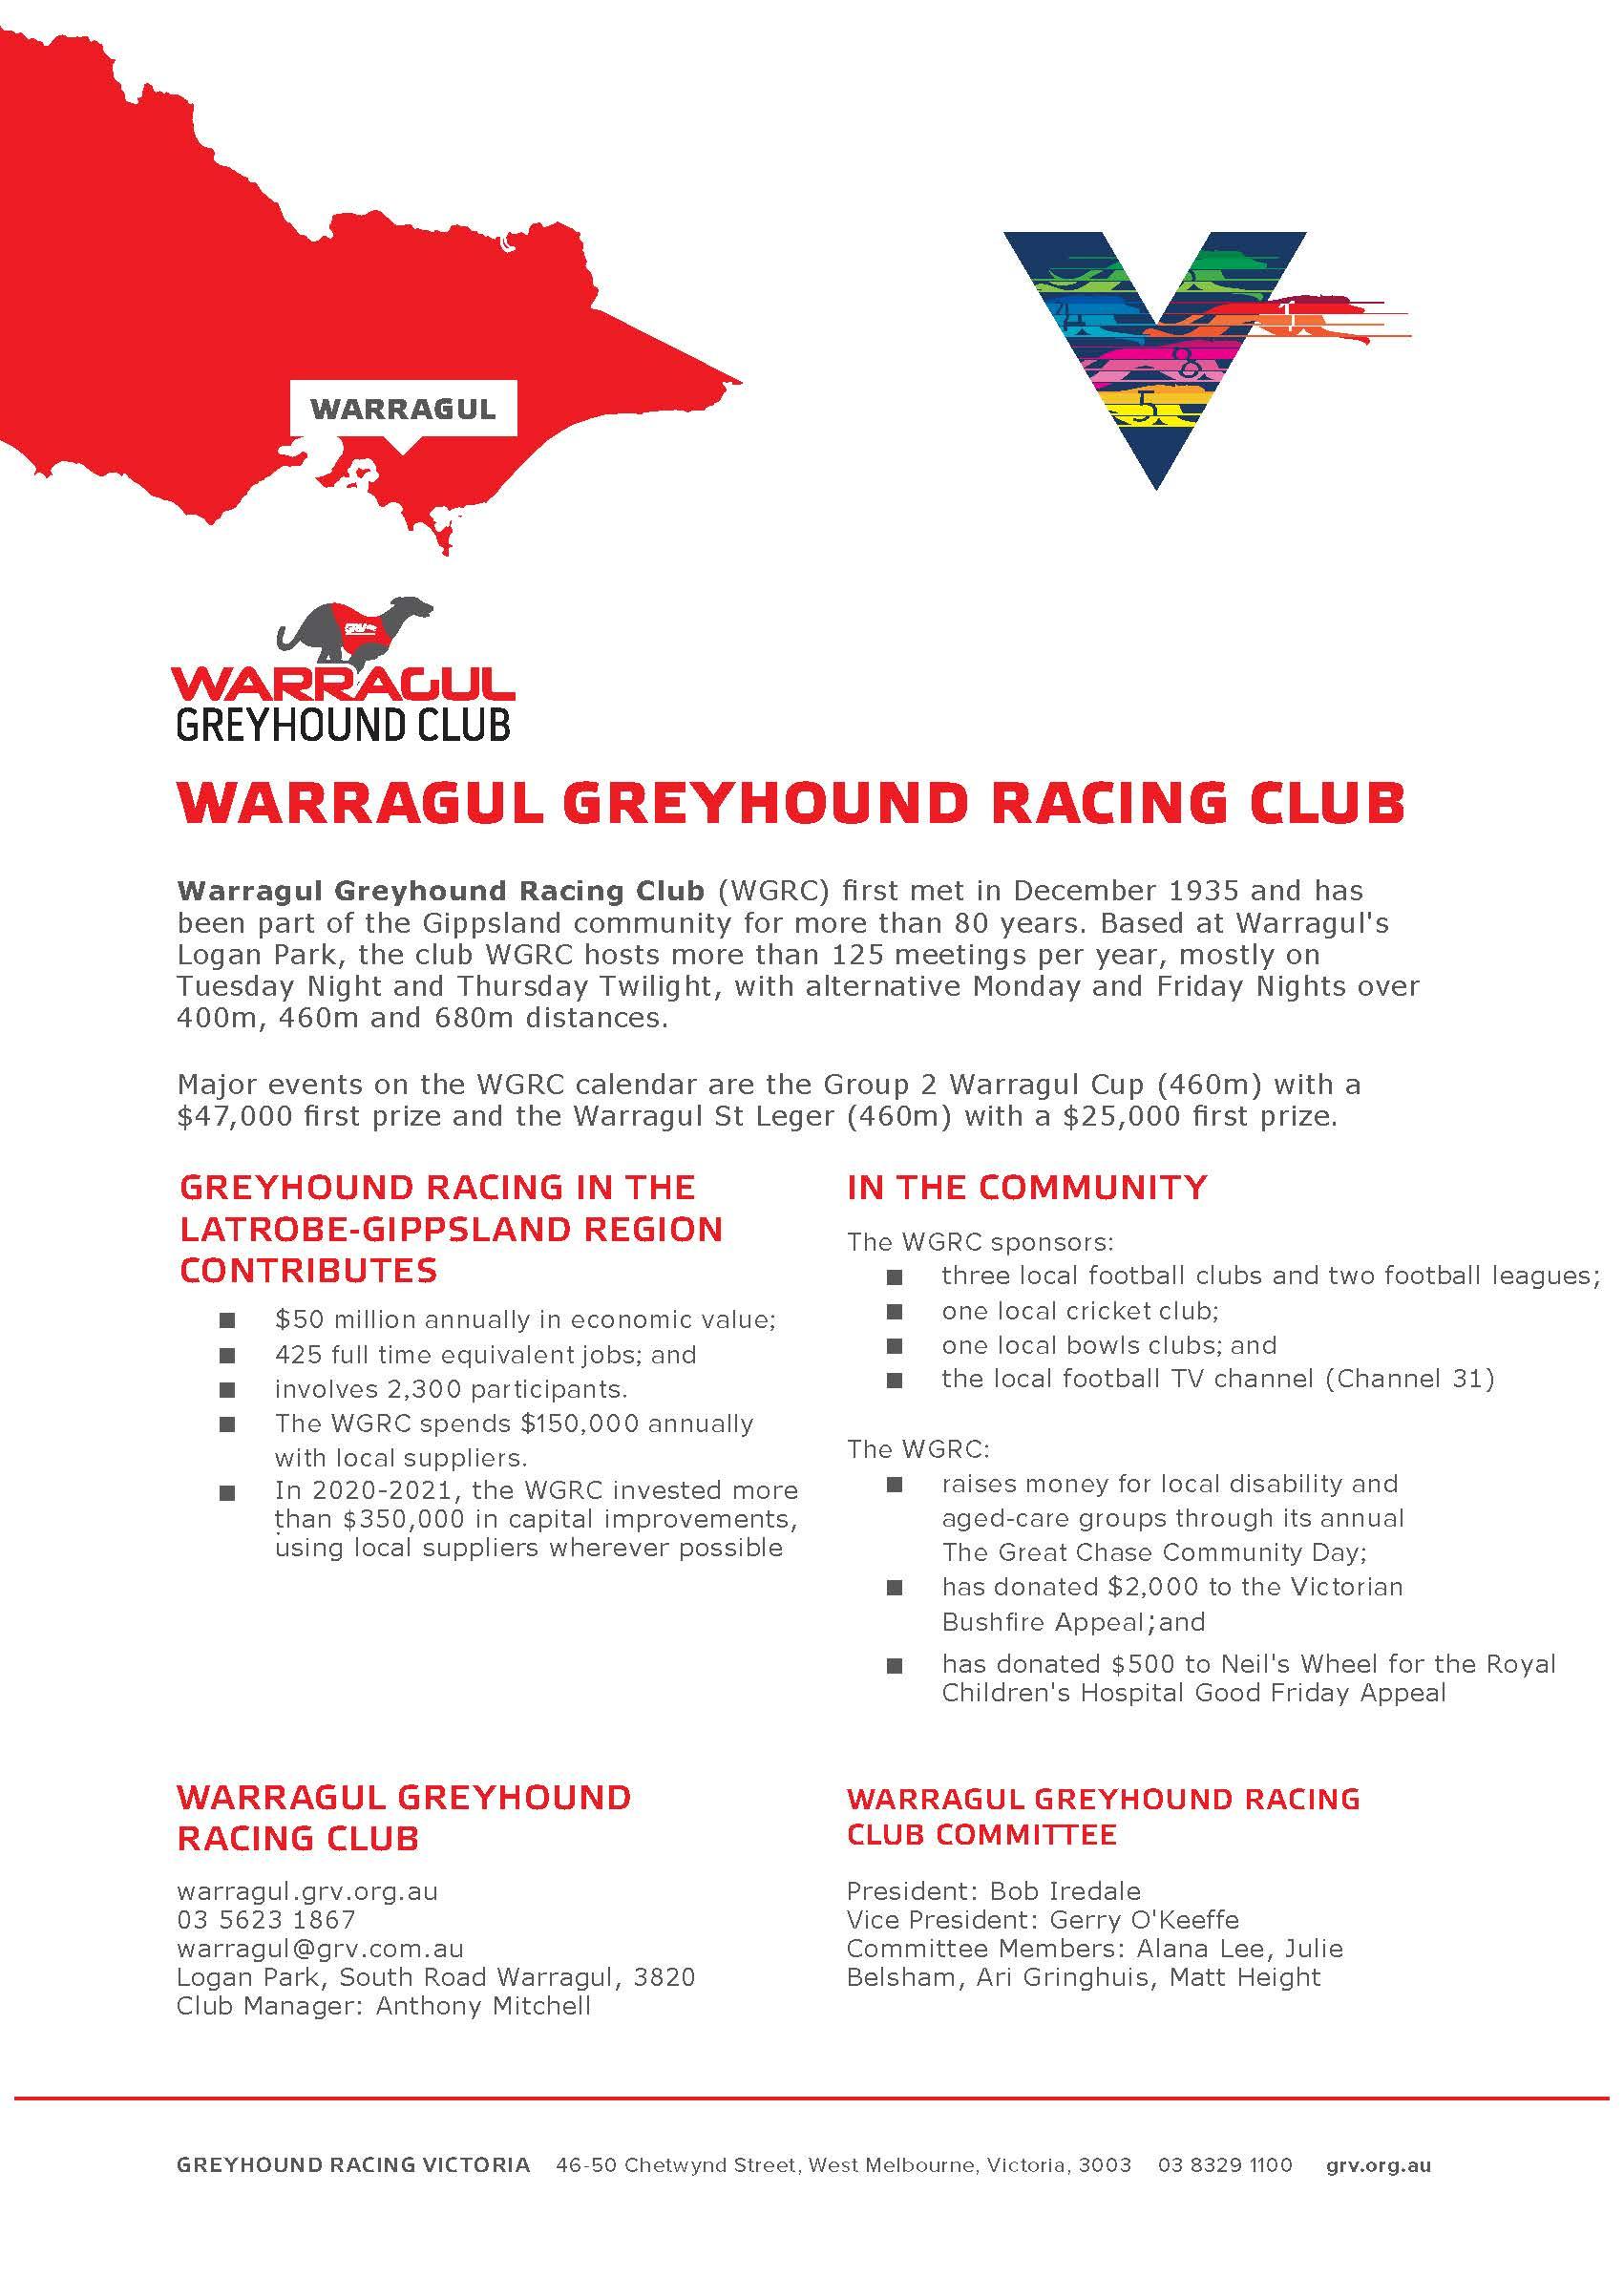 GRV_Factsheets Warragul